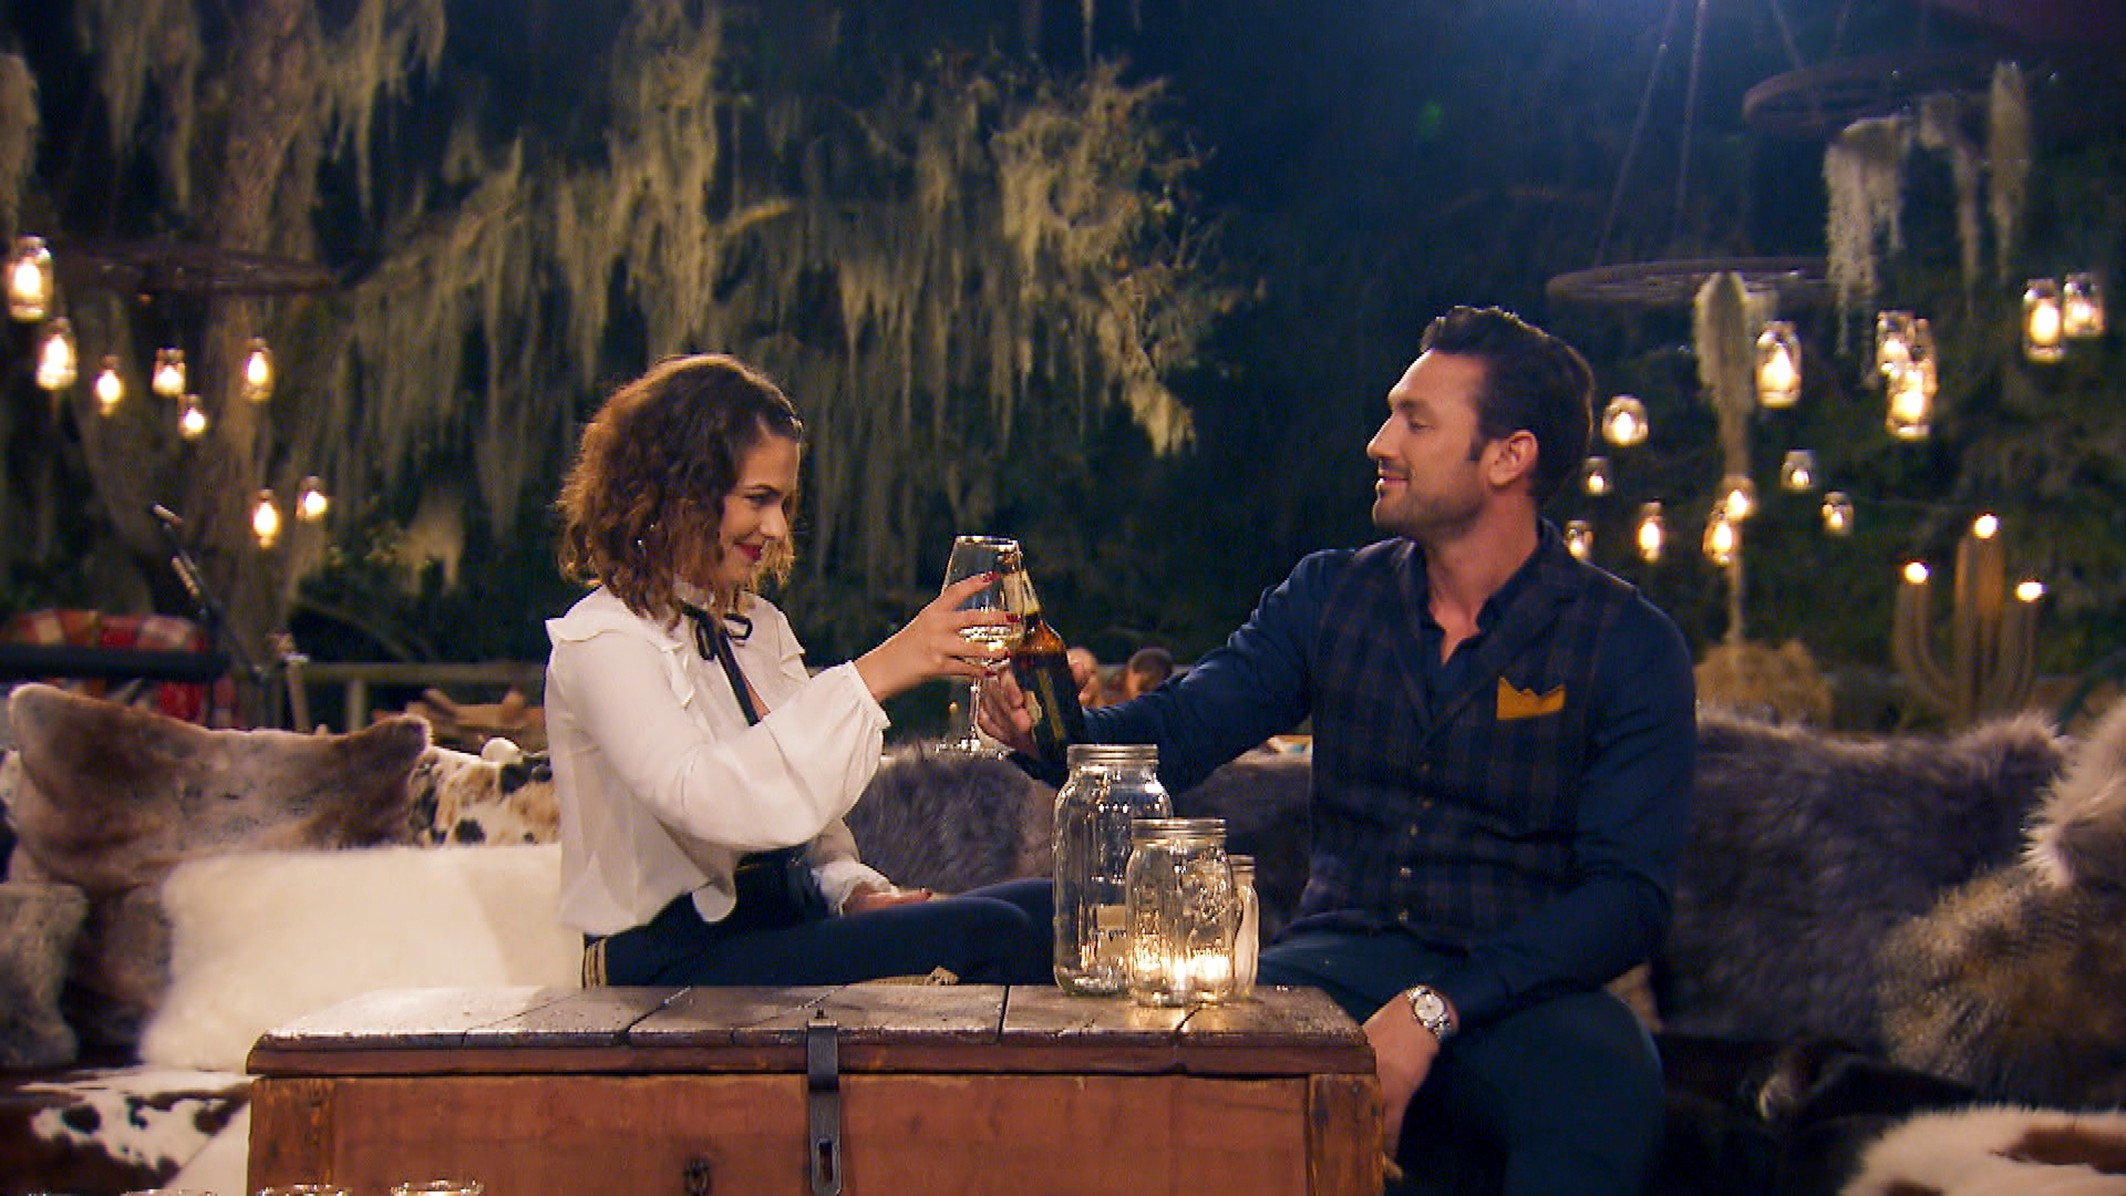 Der Bachelor 2018 Folge 6 - Janine Christin und Daniel